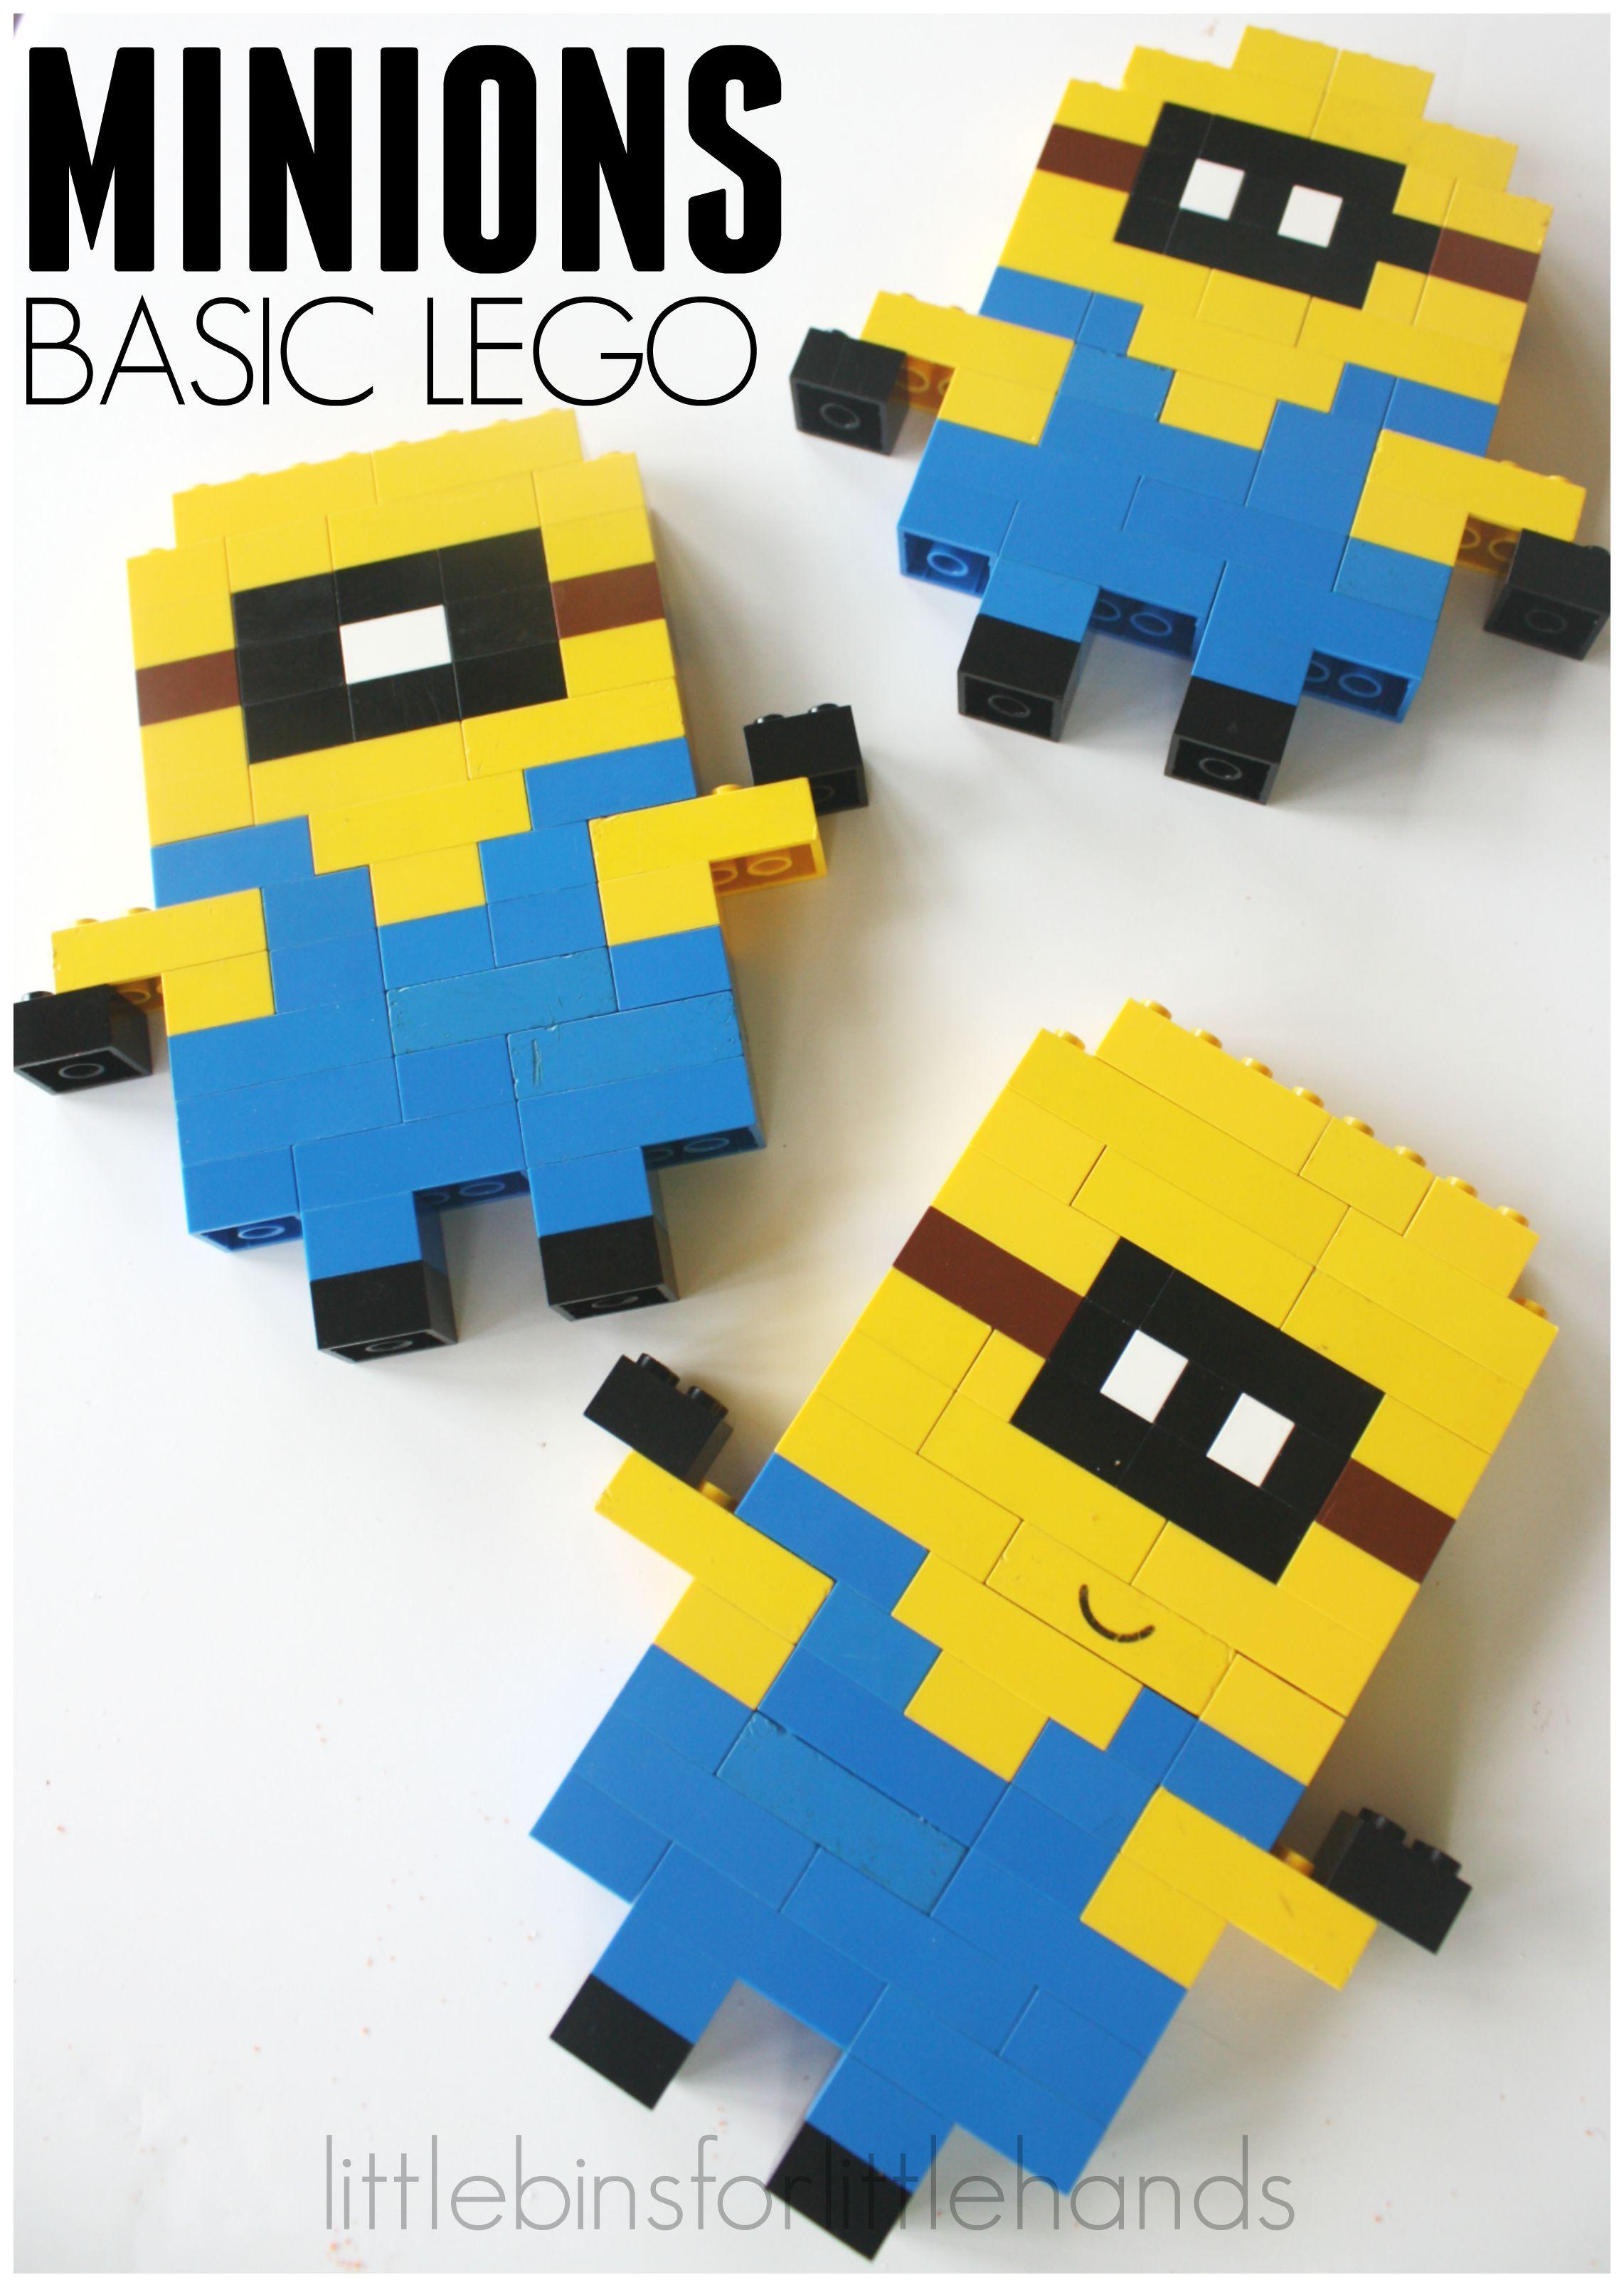 Minion LEGO Building Activity with Basic Bricks